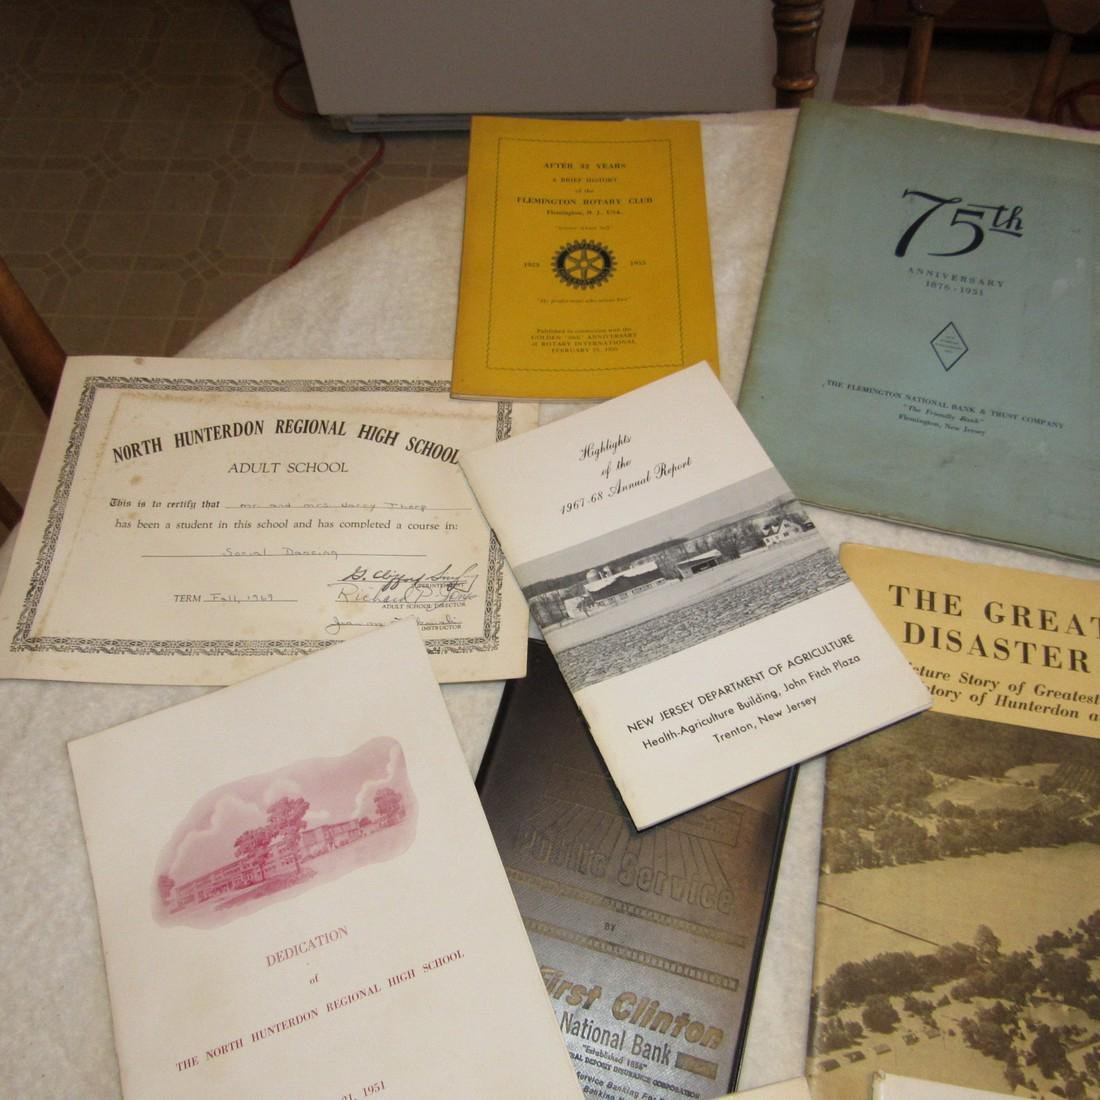 Local Books Catalogs Programs Certificate Lot - 2